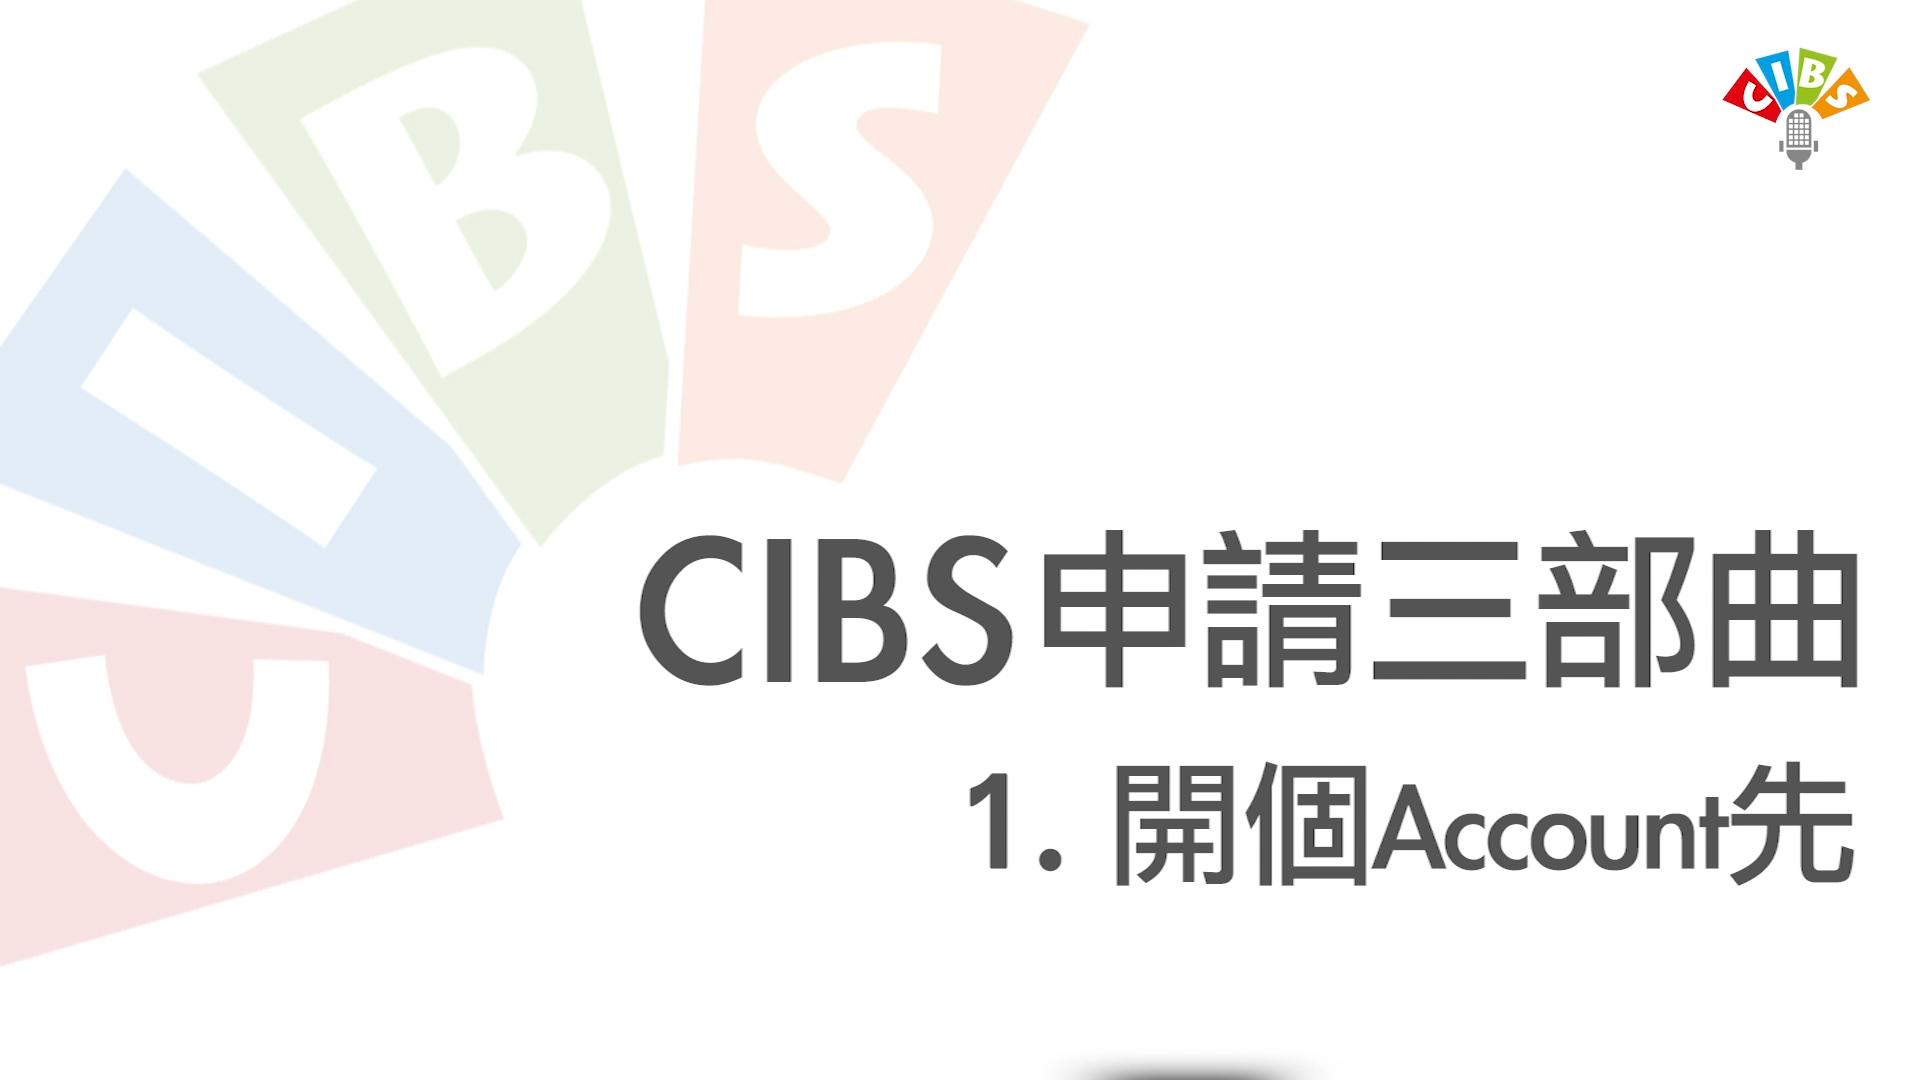 CIBS申请三部曲之一:开个Account先